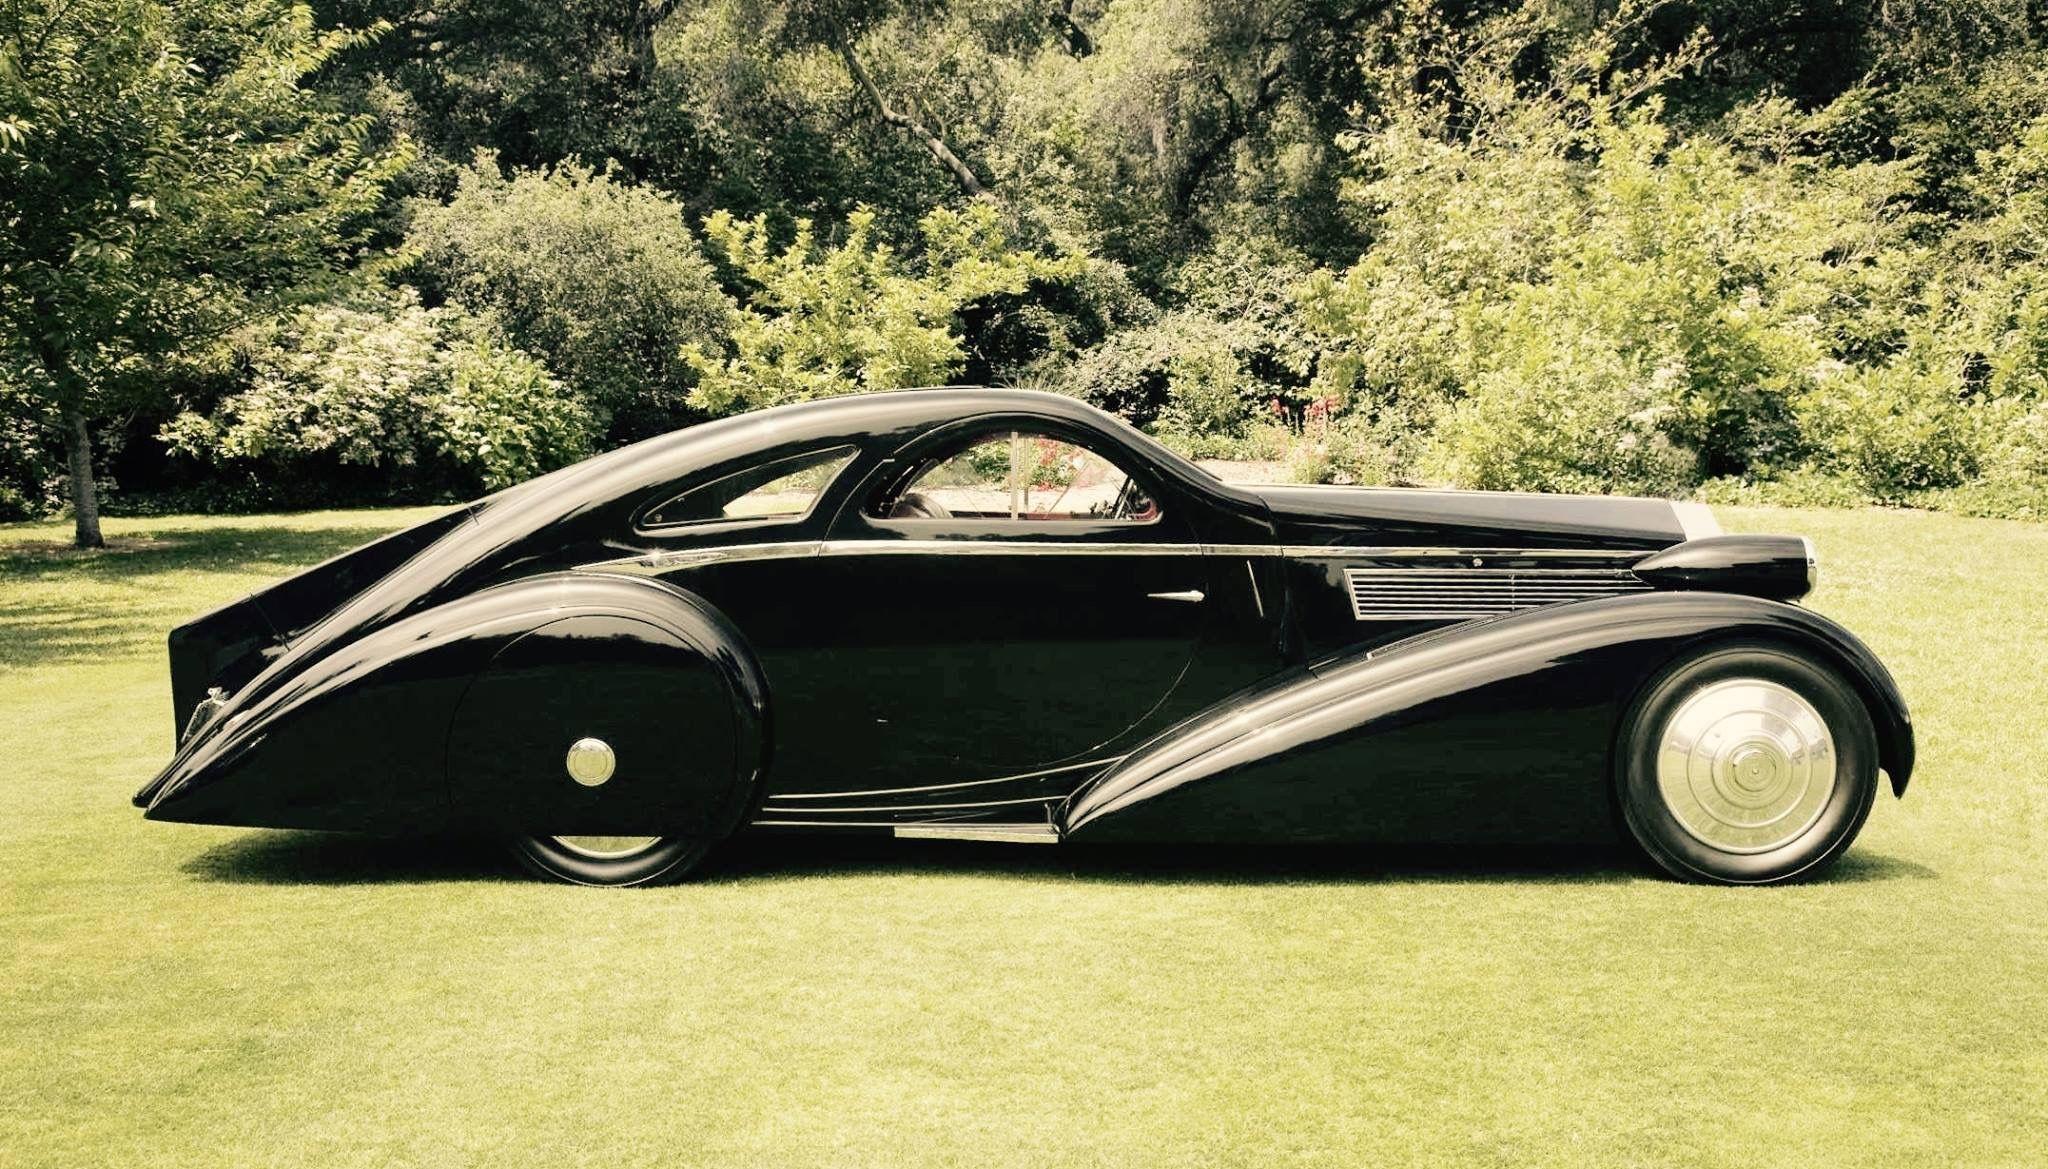 1925 Rolls Royce Phantom >> 1925 Rolls Royce Phantom I Jonckheere Coupe Rolls Royce